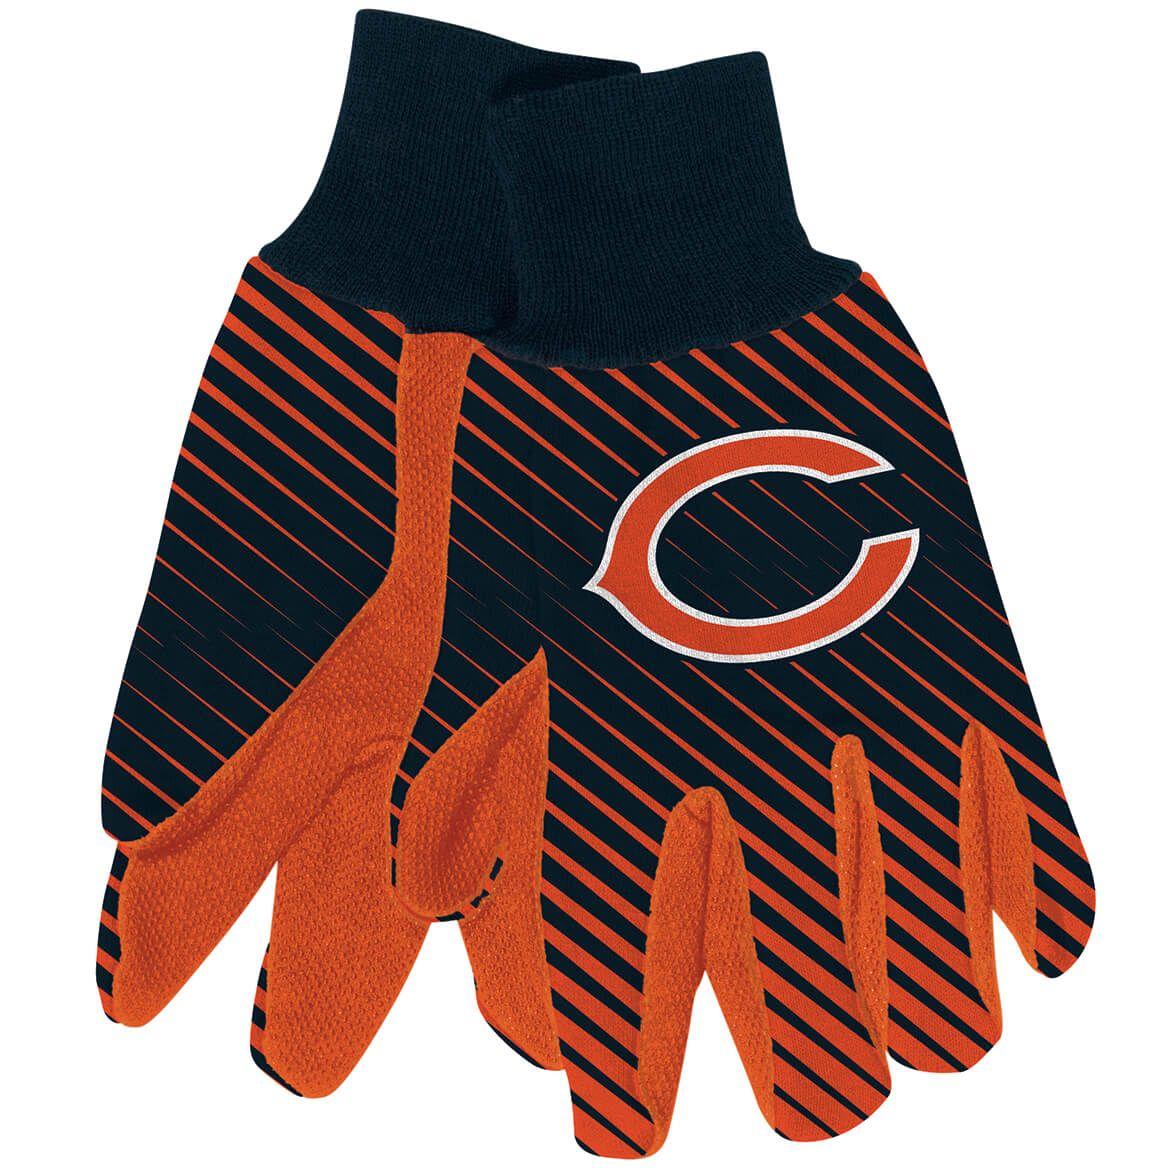 NFL Team Sport Utility Gloves, One Size-366100